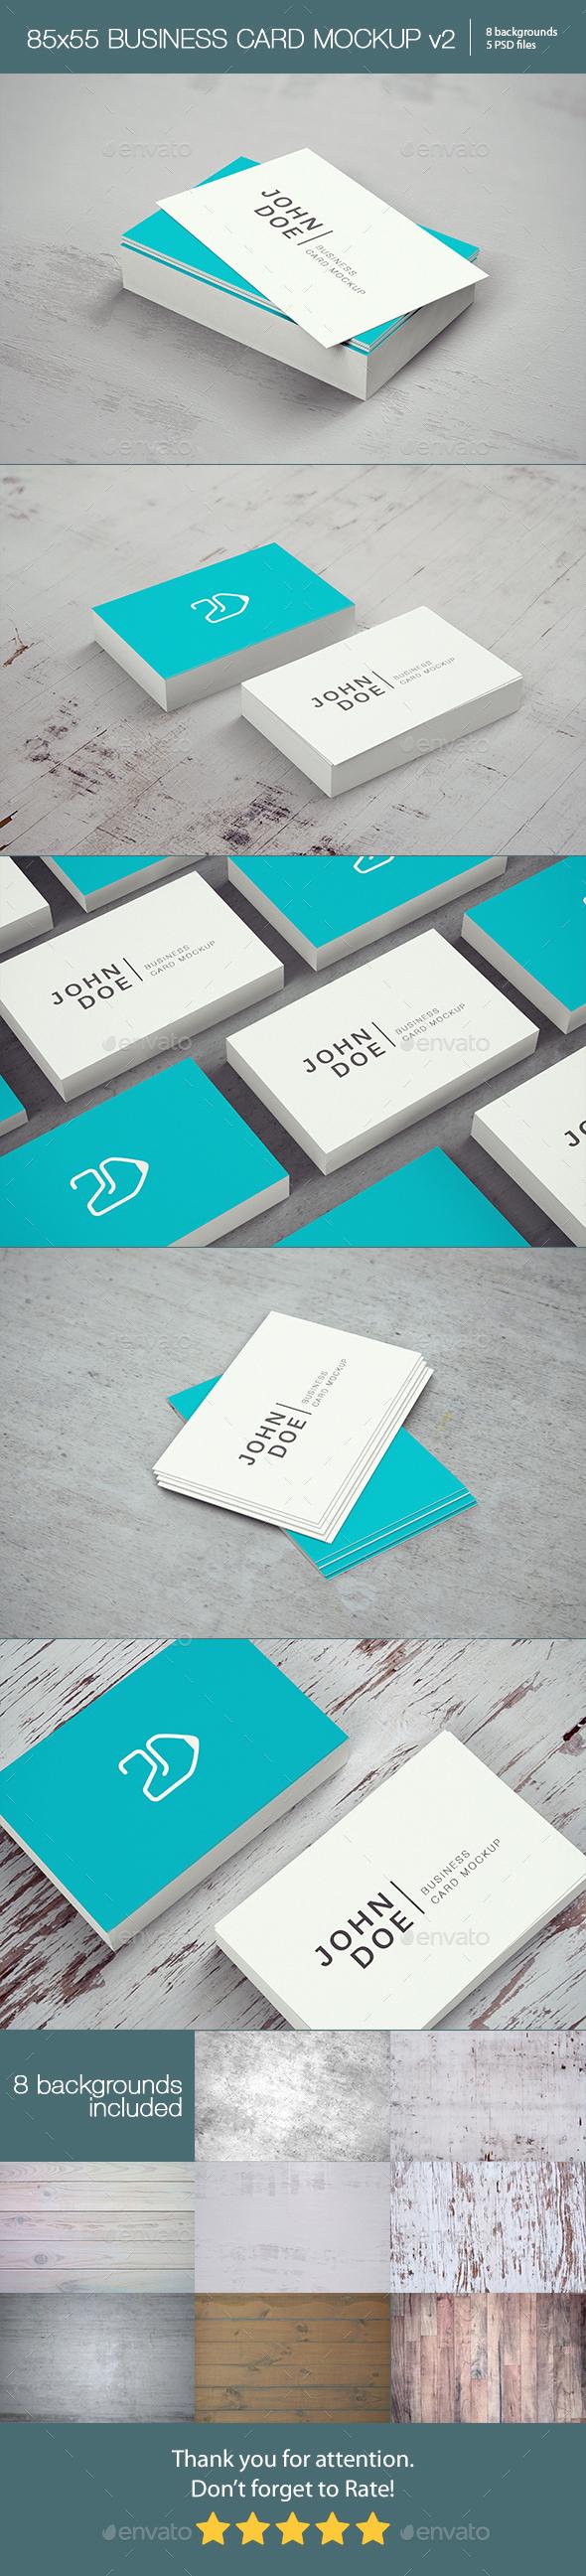 85x55 Business Card Mockup v2 - Business Cards Print